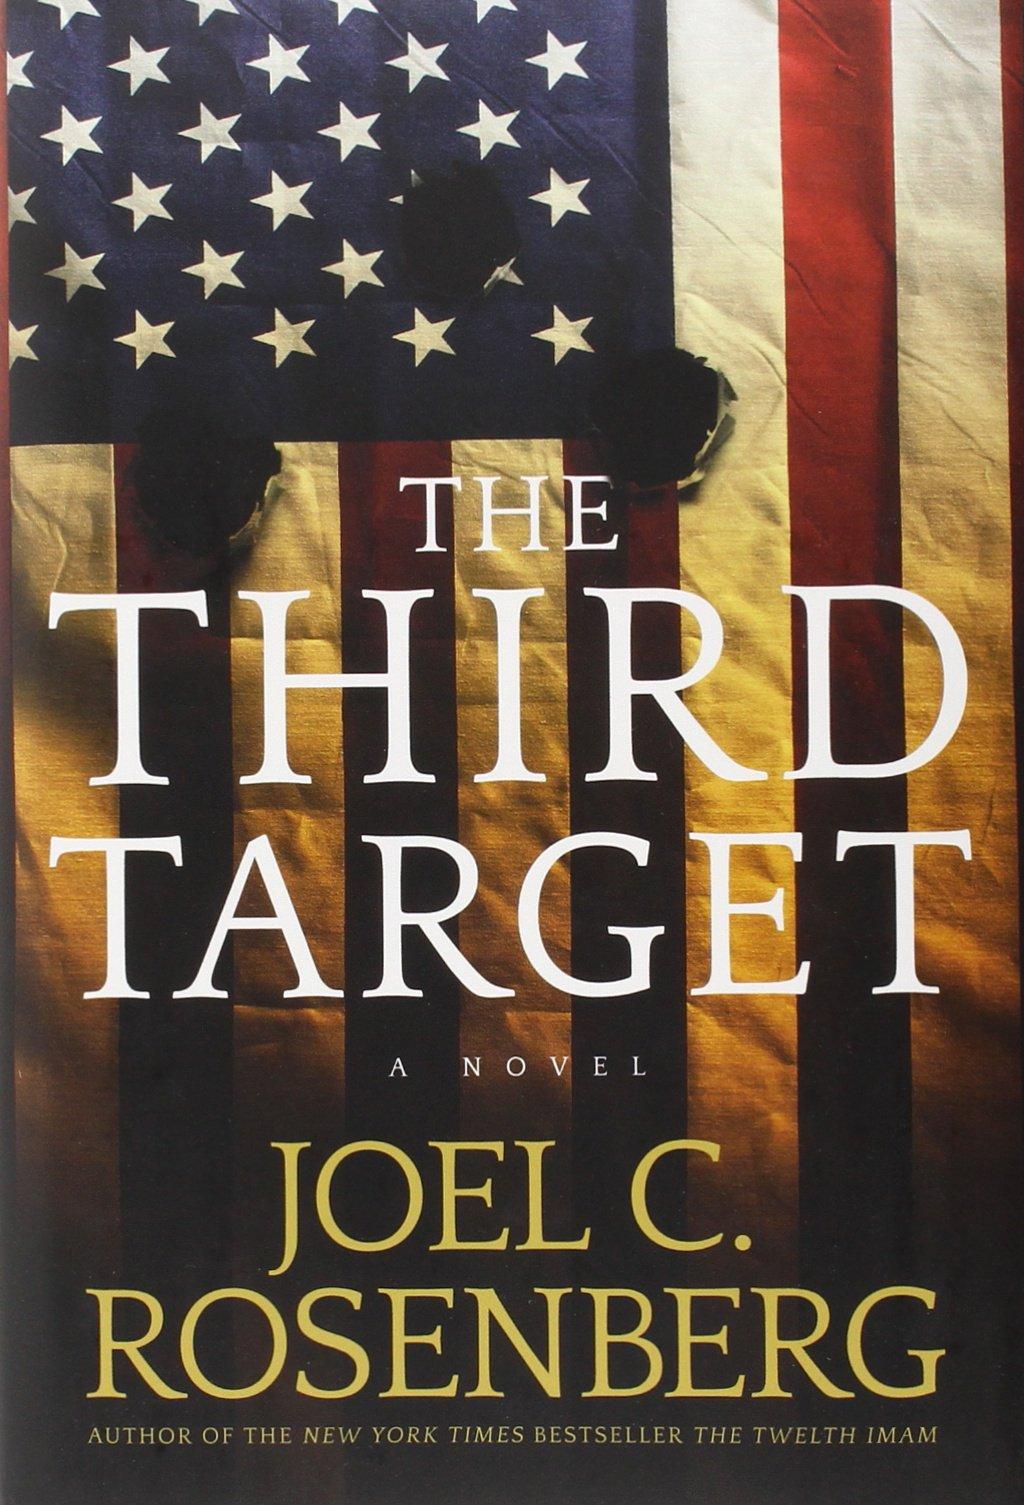 The Third Target, by Joel C. Rosenberg